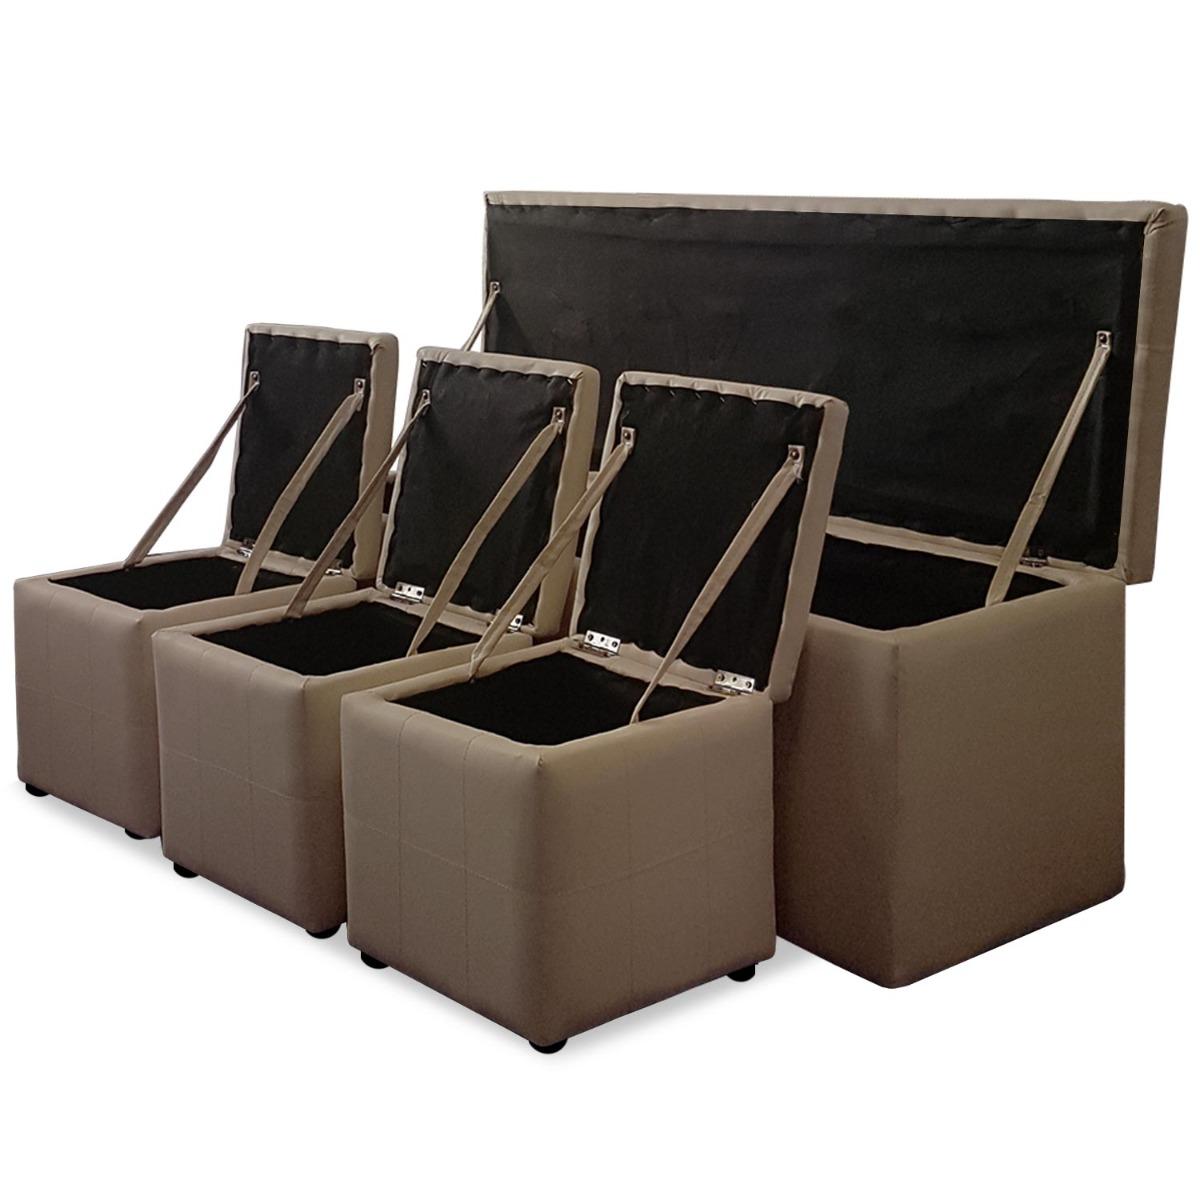 Panky XL-kistbank + 3 bruine voetenbankjes